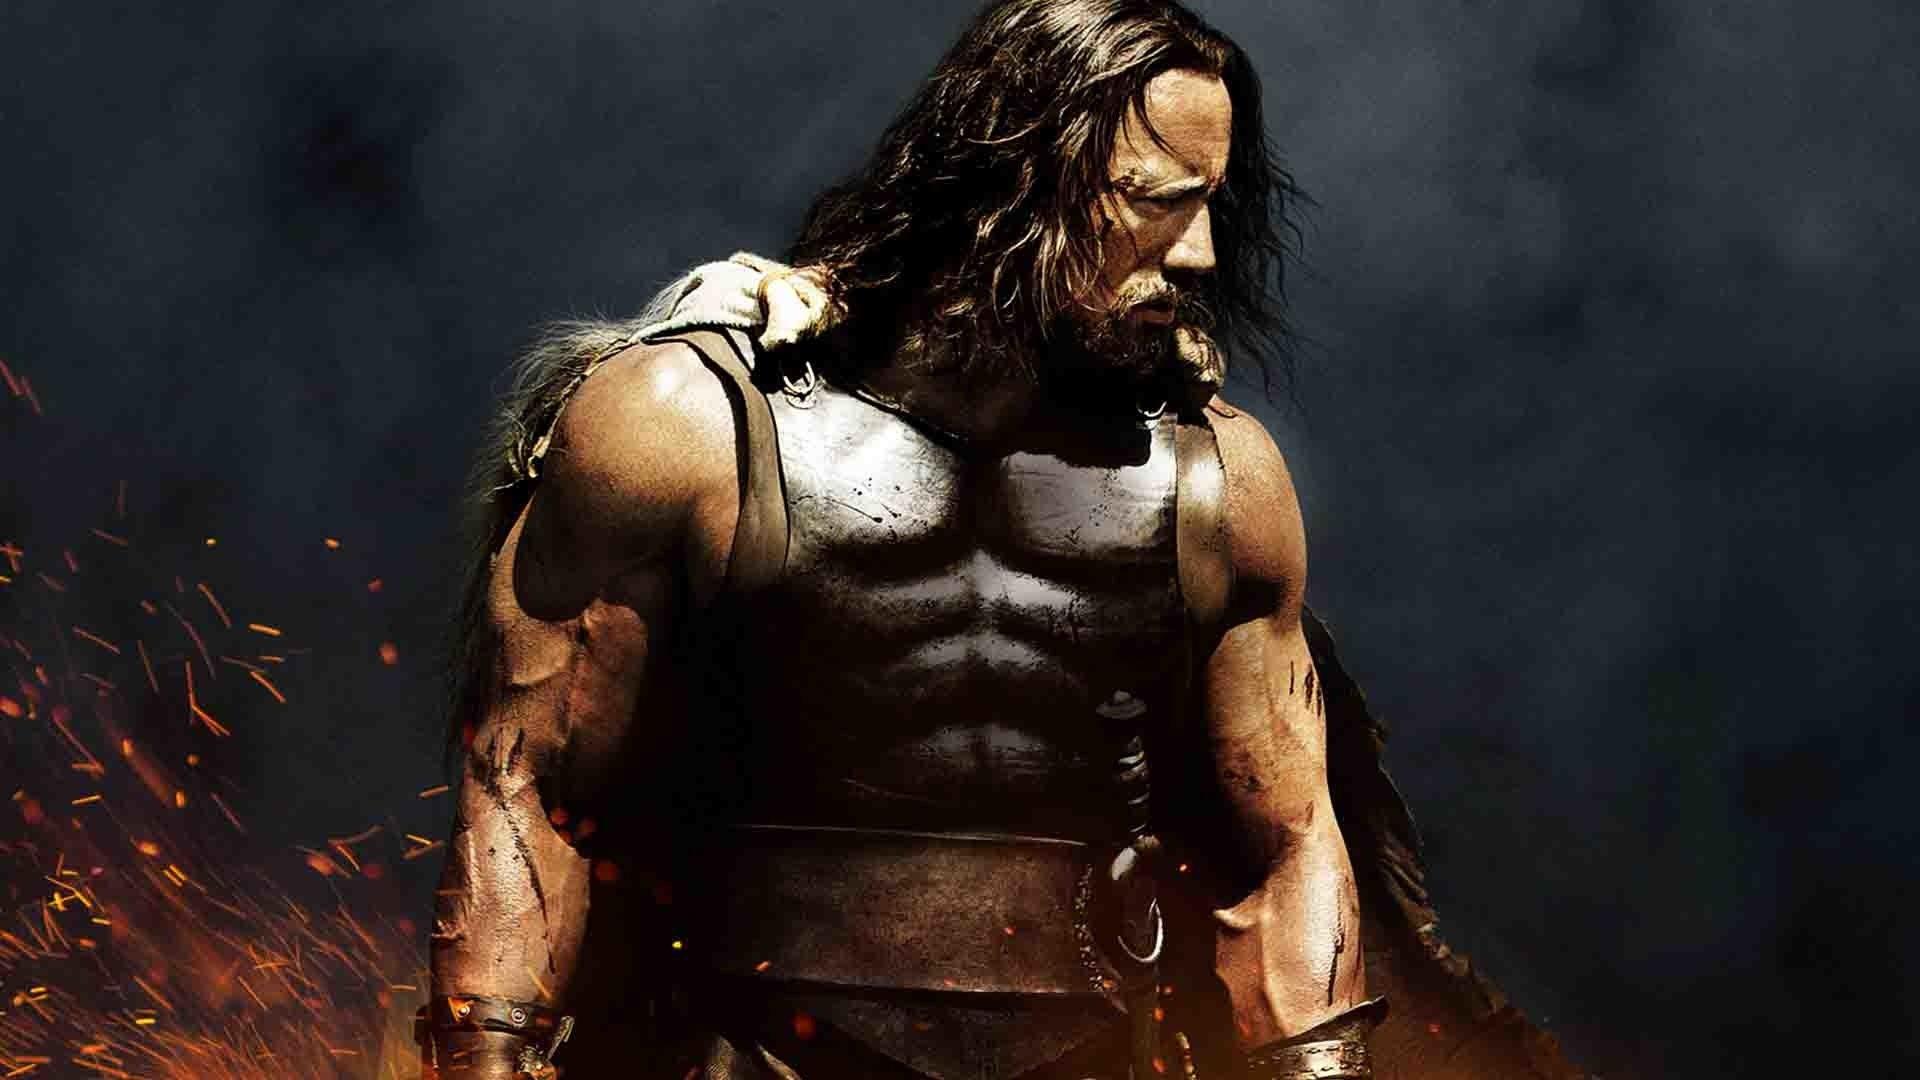 Hercules Retina Movie Wallpaper: Hercules (2014) HD Wallpaper